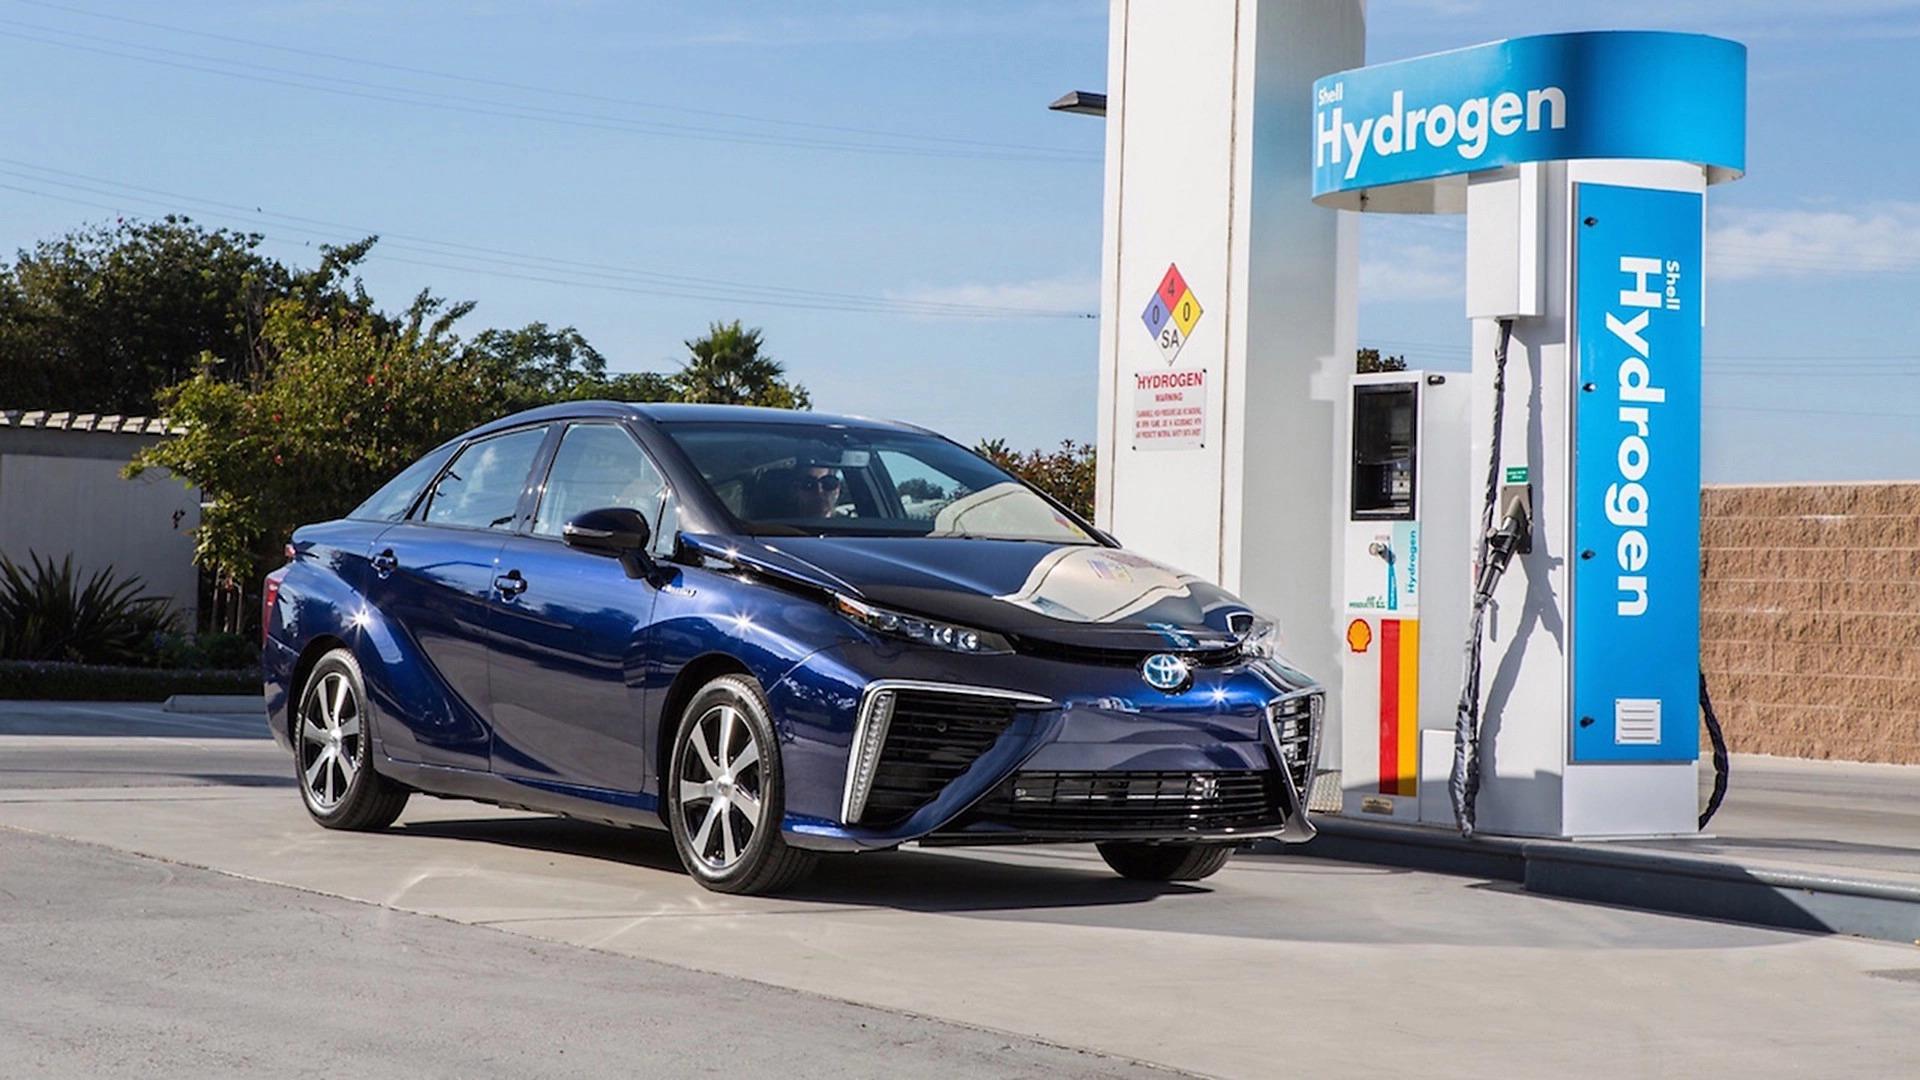 Auto a idrogeno: i vantaggi principali